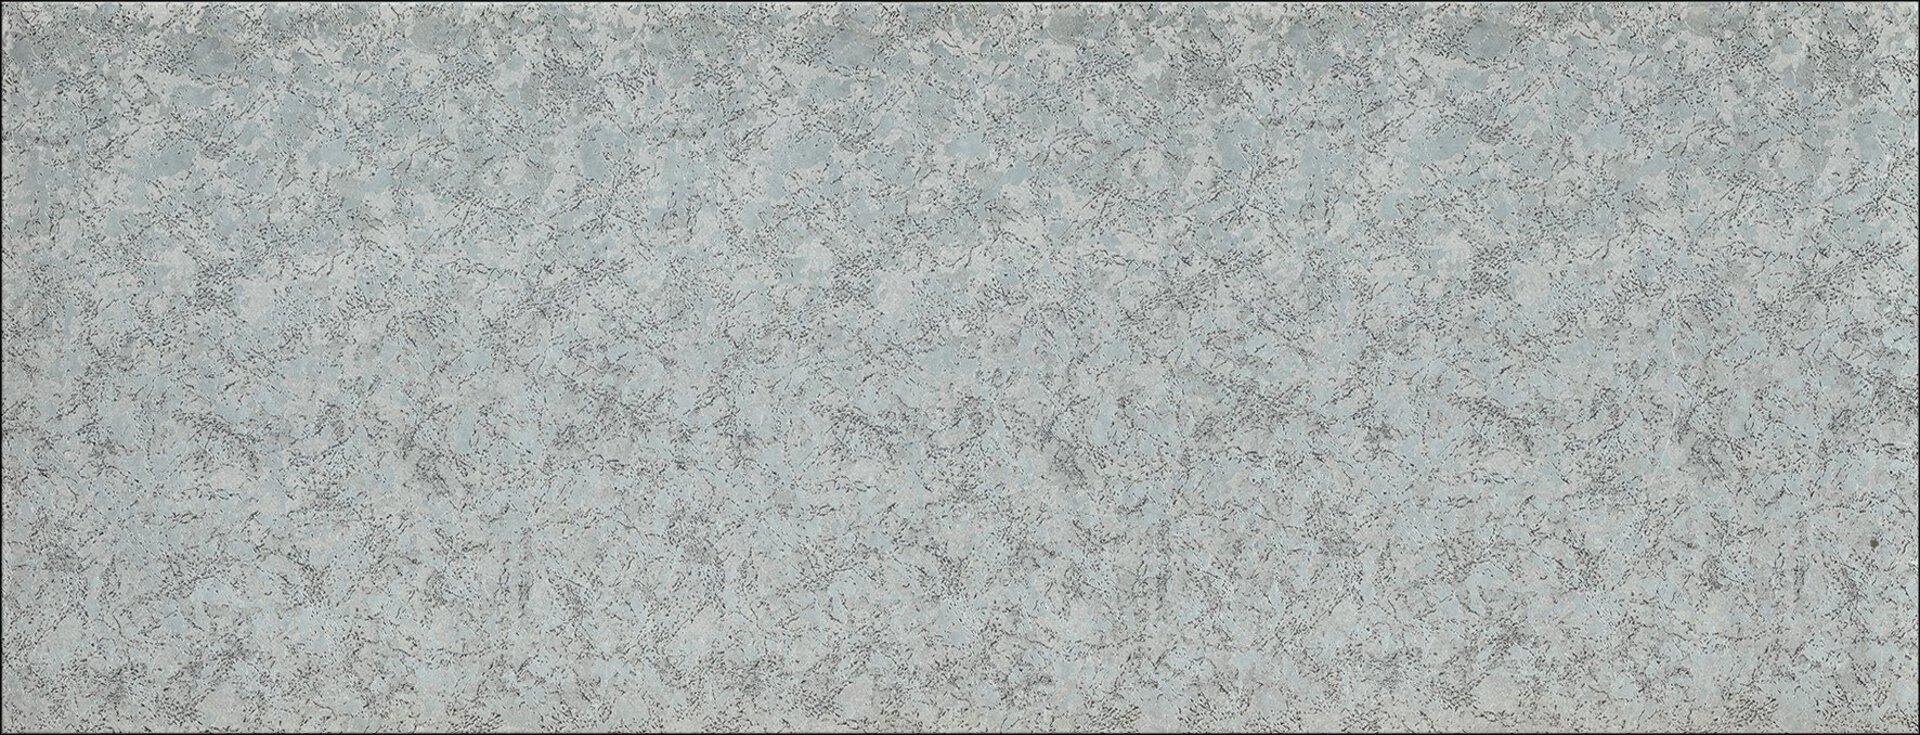 Bild Silber Pro-Art Glas 80 x 30 x 1 cm